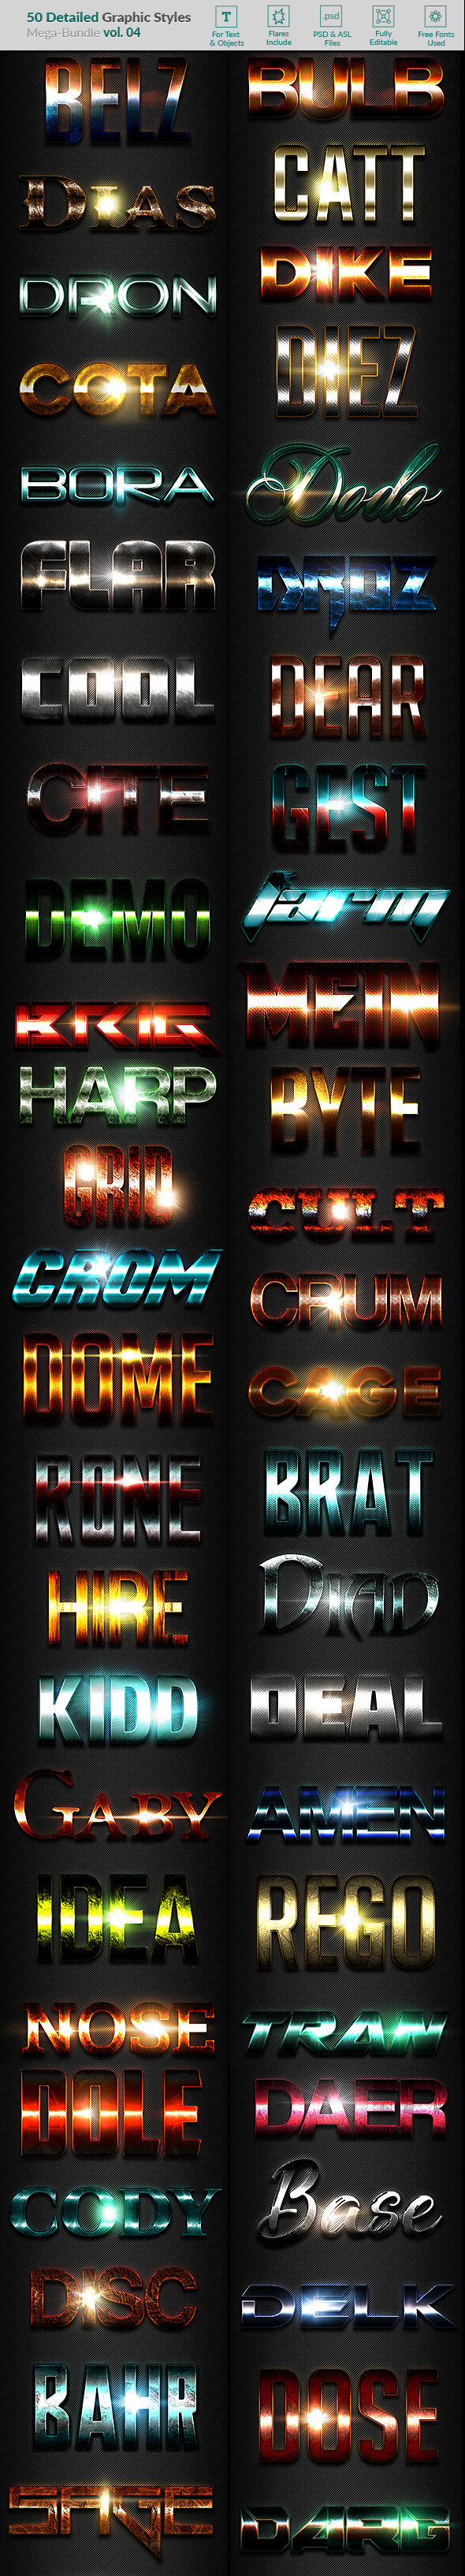 50 Text Effects - Bundle Vol. 04 - Styles Photoshop